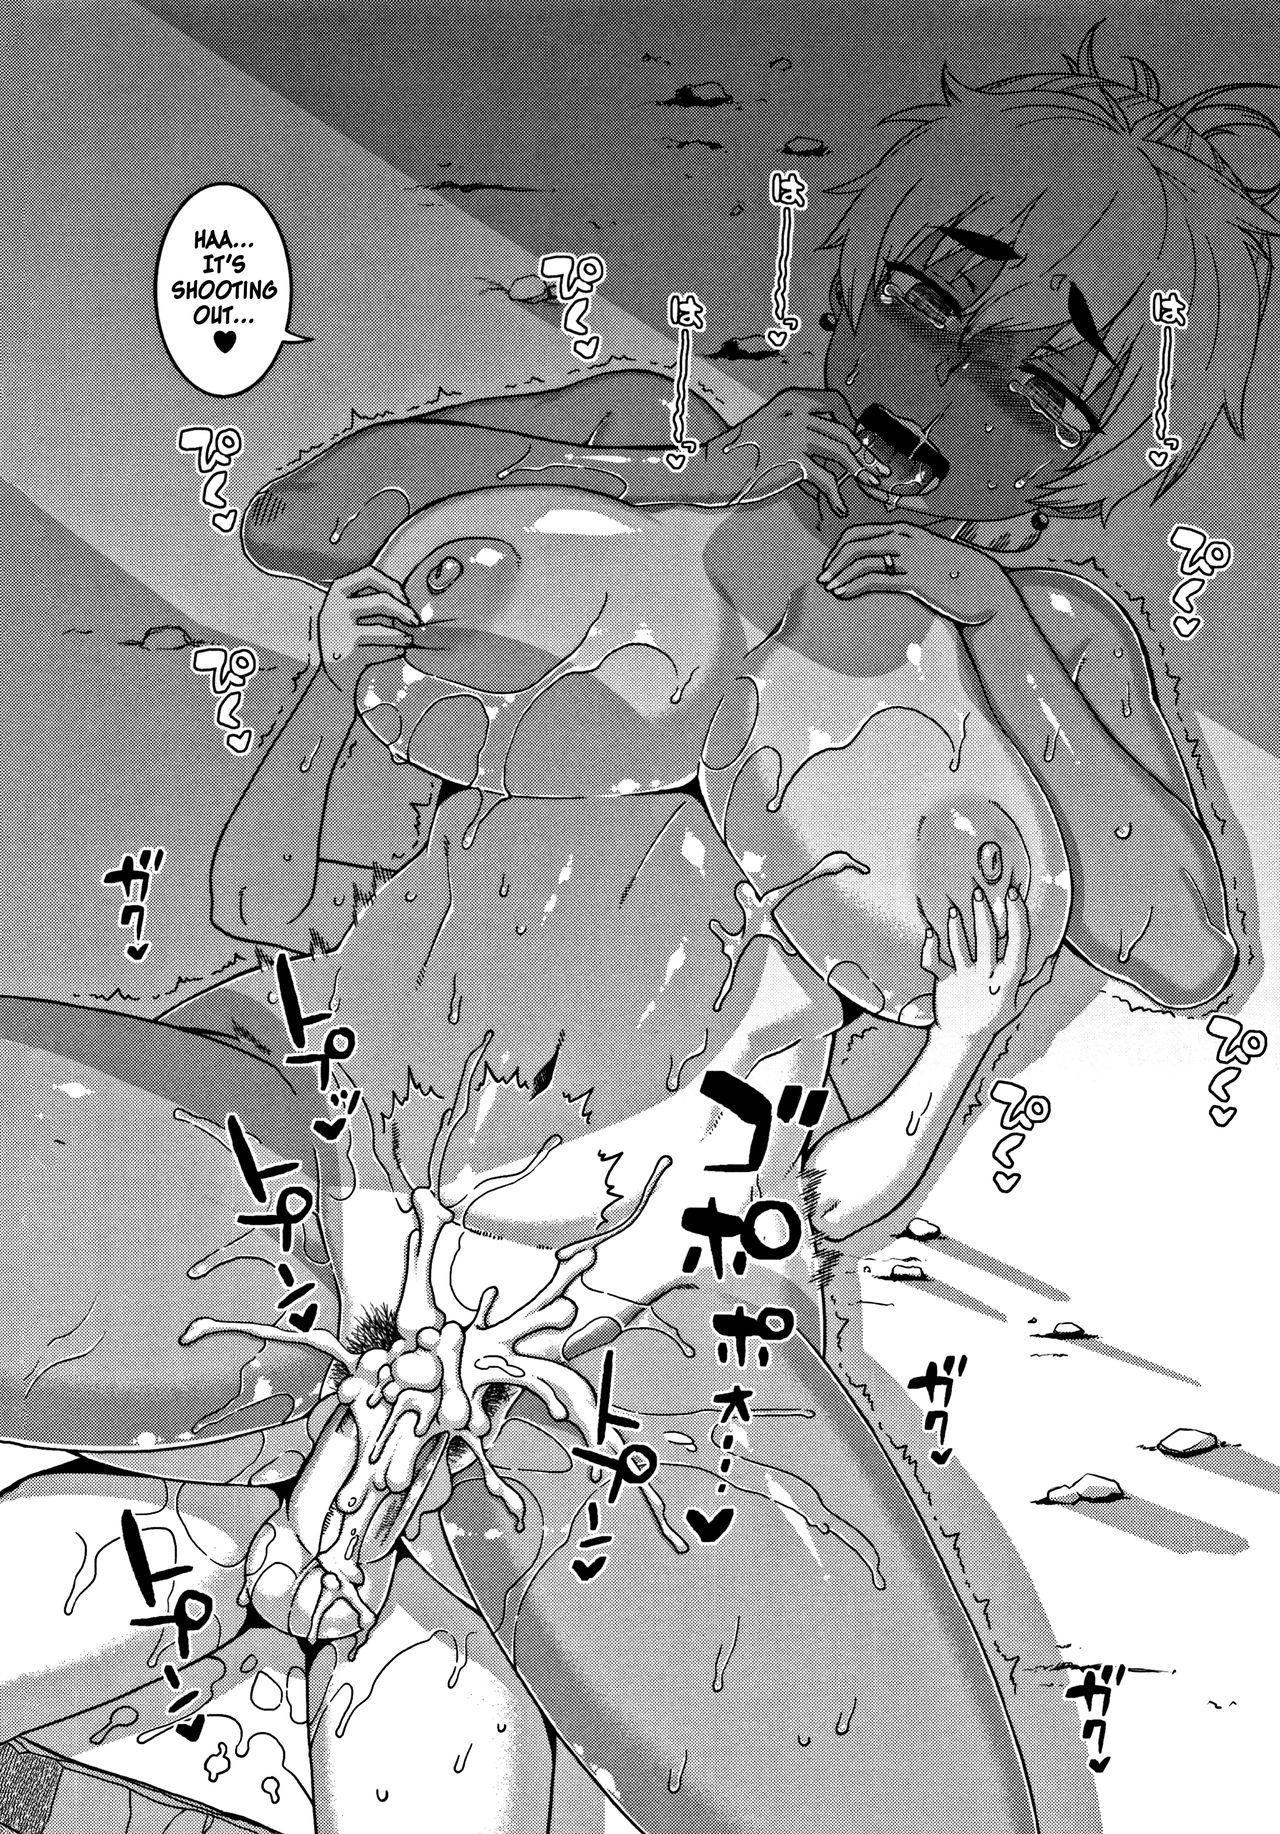 [Takatsu] Hitozuma A-san to Musuko no Yuujin N-kun - Married wife A and son's friend N-kun [English] 70